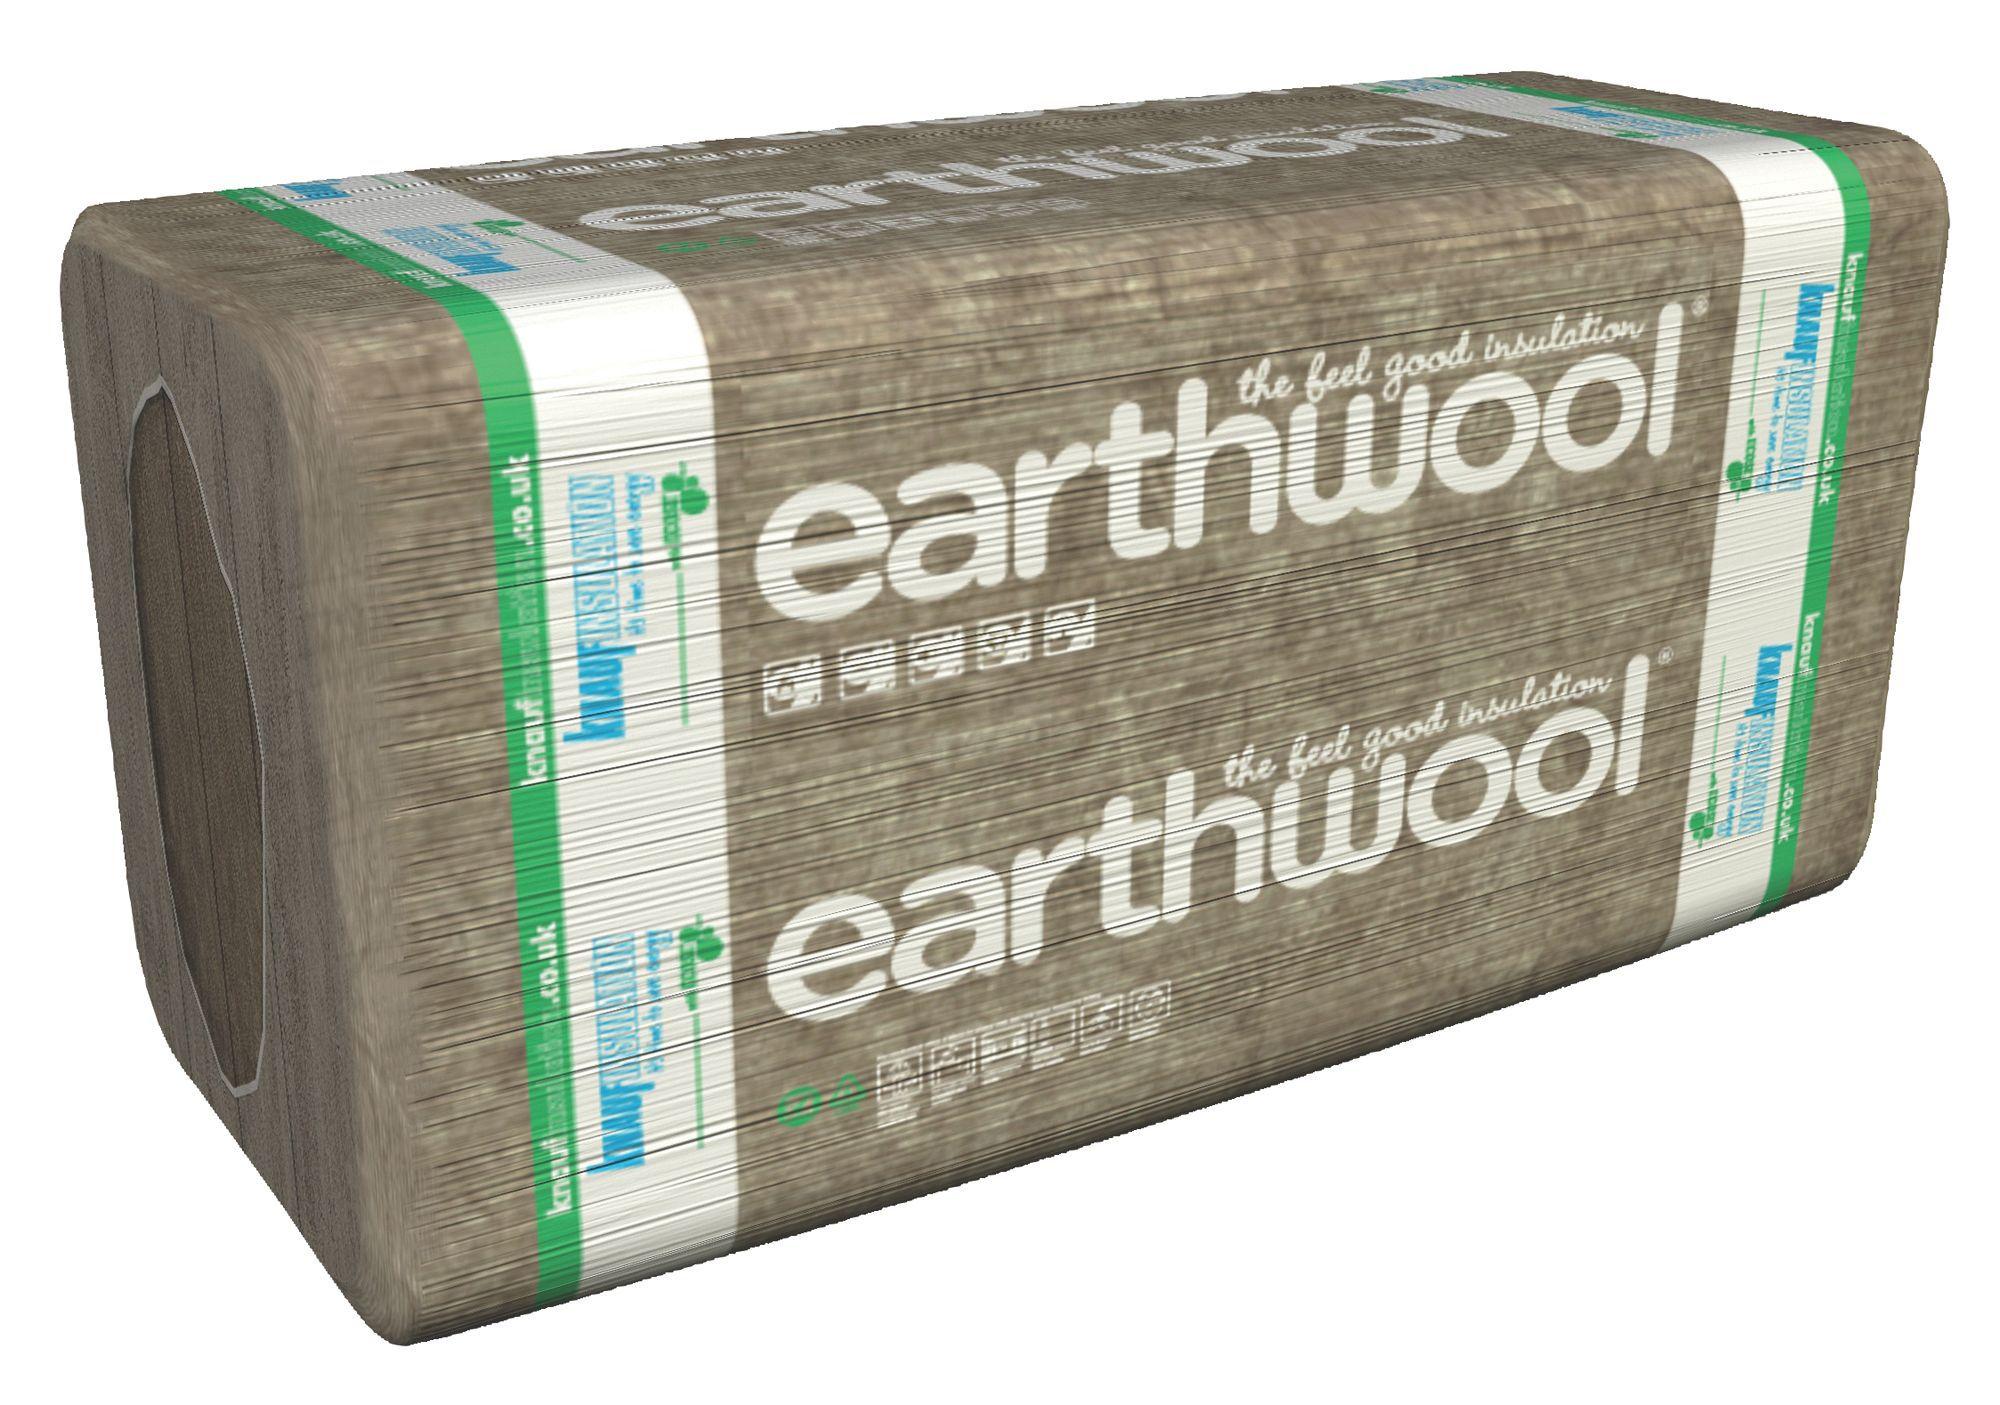 Knauf Earthwool Cavity Slab 12m 600mm 50mm Departments  : 501206182903701c from www.diy.com size 2000 x 1405 jpeg 337kB